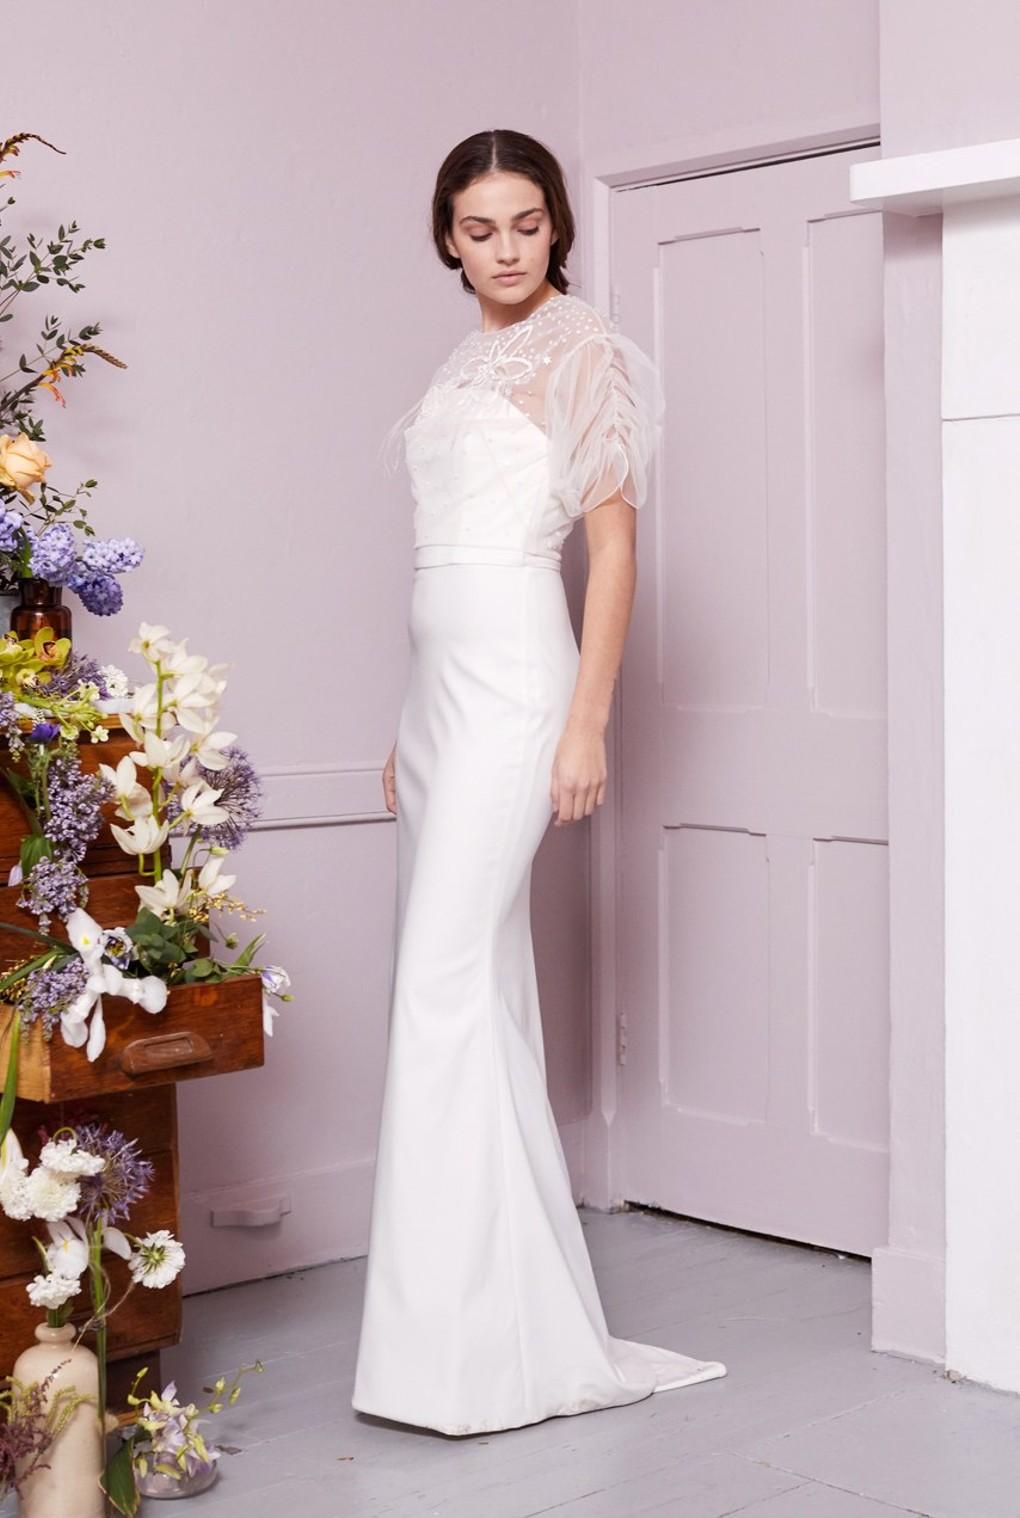 50 Inspirasi Gaun Pengantin Dari Koleksi Bridal Fashion